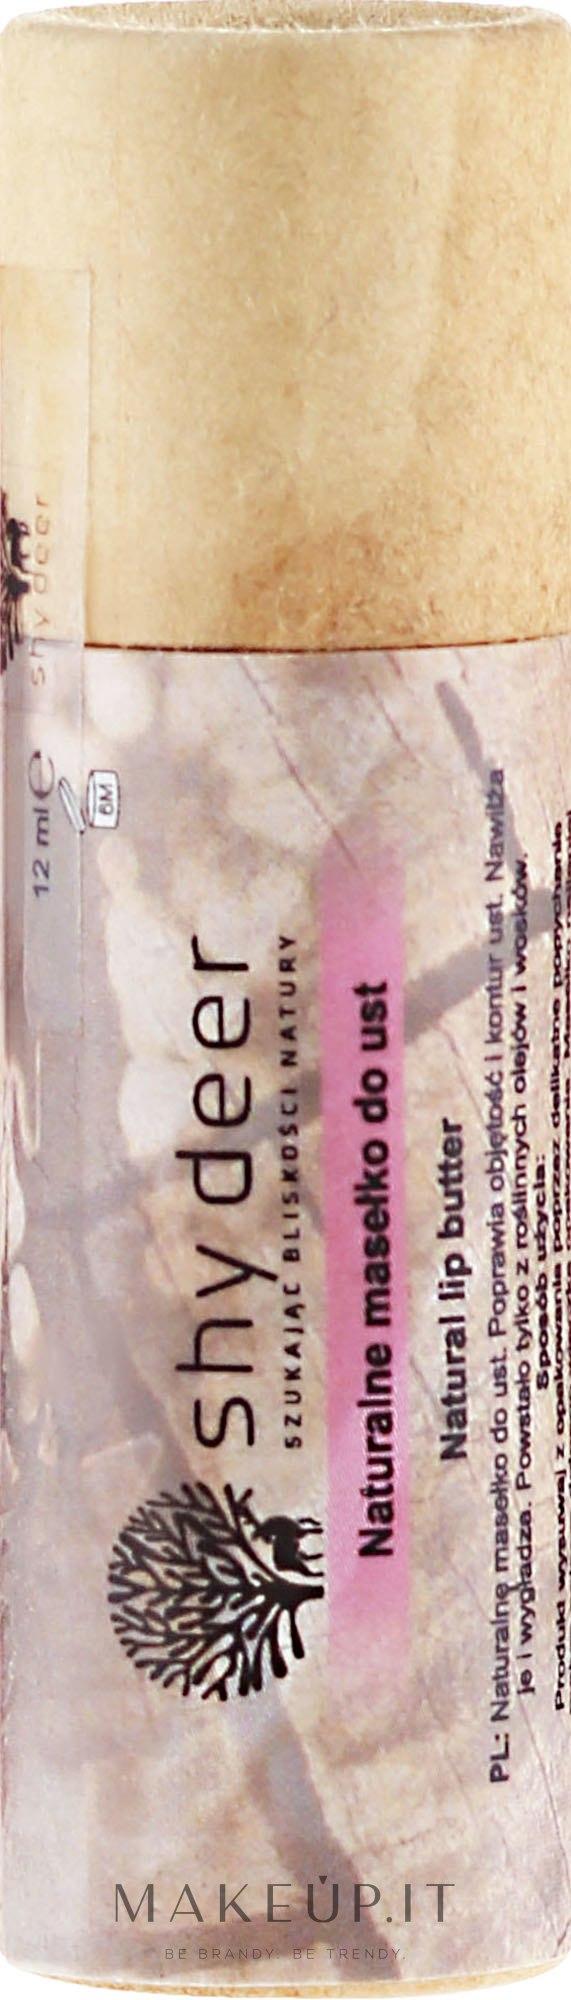 Olio naturale per le labbra - Shy Deer Natural Lip Butter — foto 12 ml